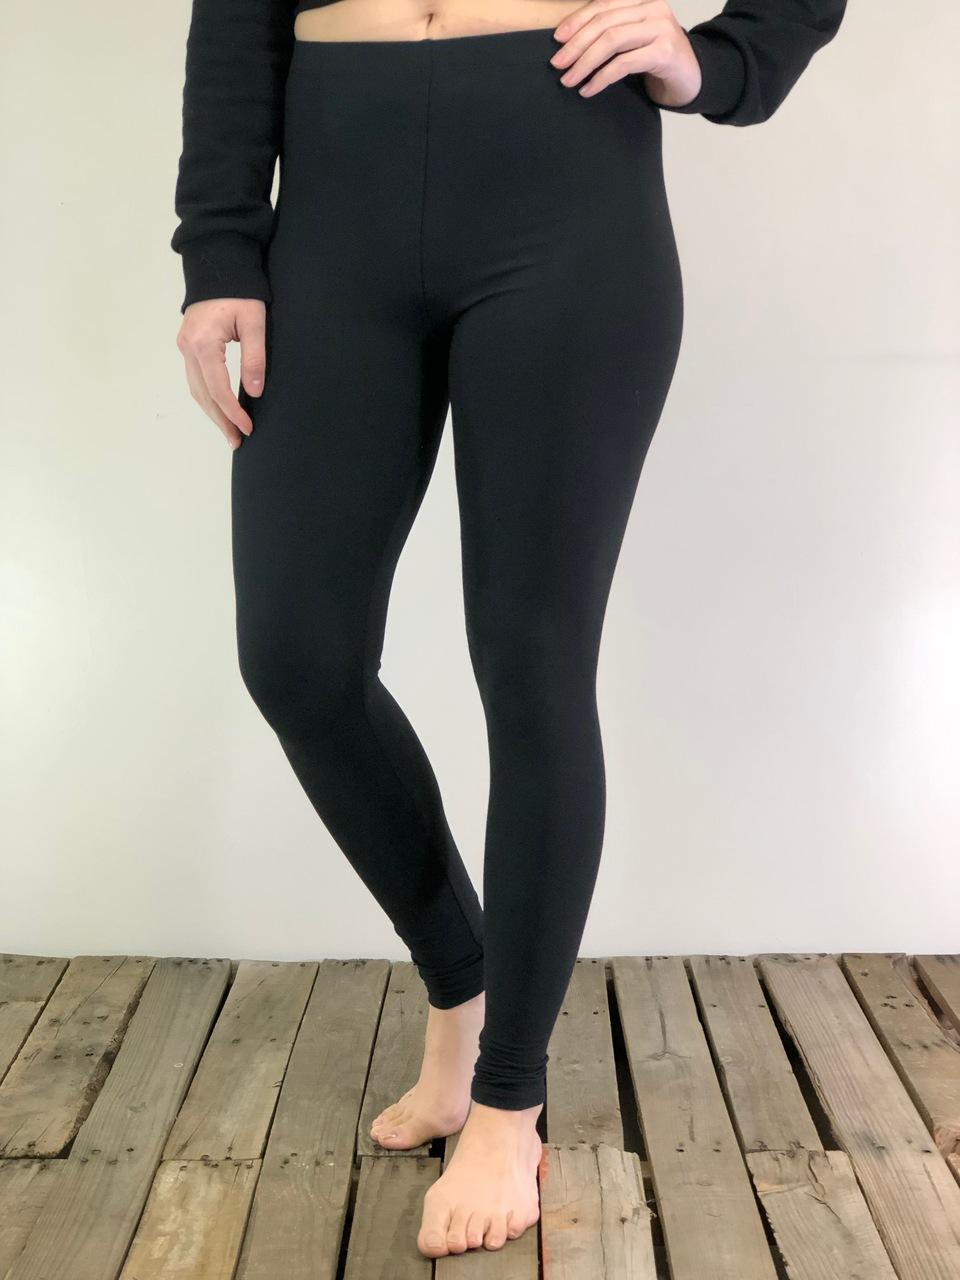 b69450d605648 Plus Size- Solid Colors - Legging Army